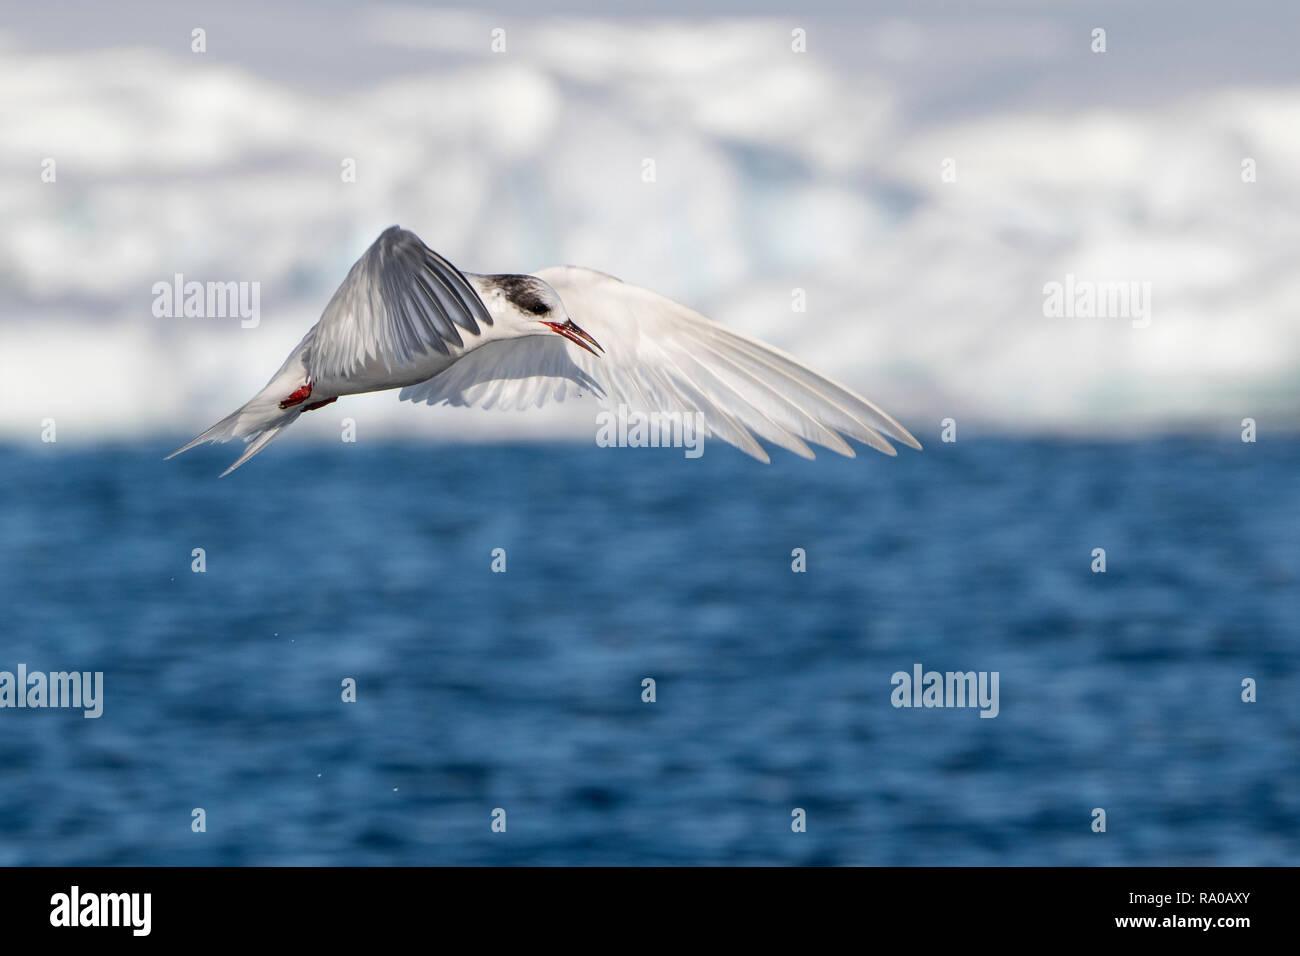 Antarctica, Antarctic peninsula, Gerlach Straight, Wilhelmina Bay in the Enterprise Island area. Antarctic tern (Sterna vittata) in flight. Stock Photo